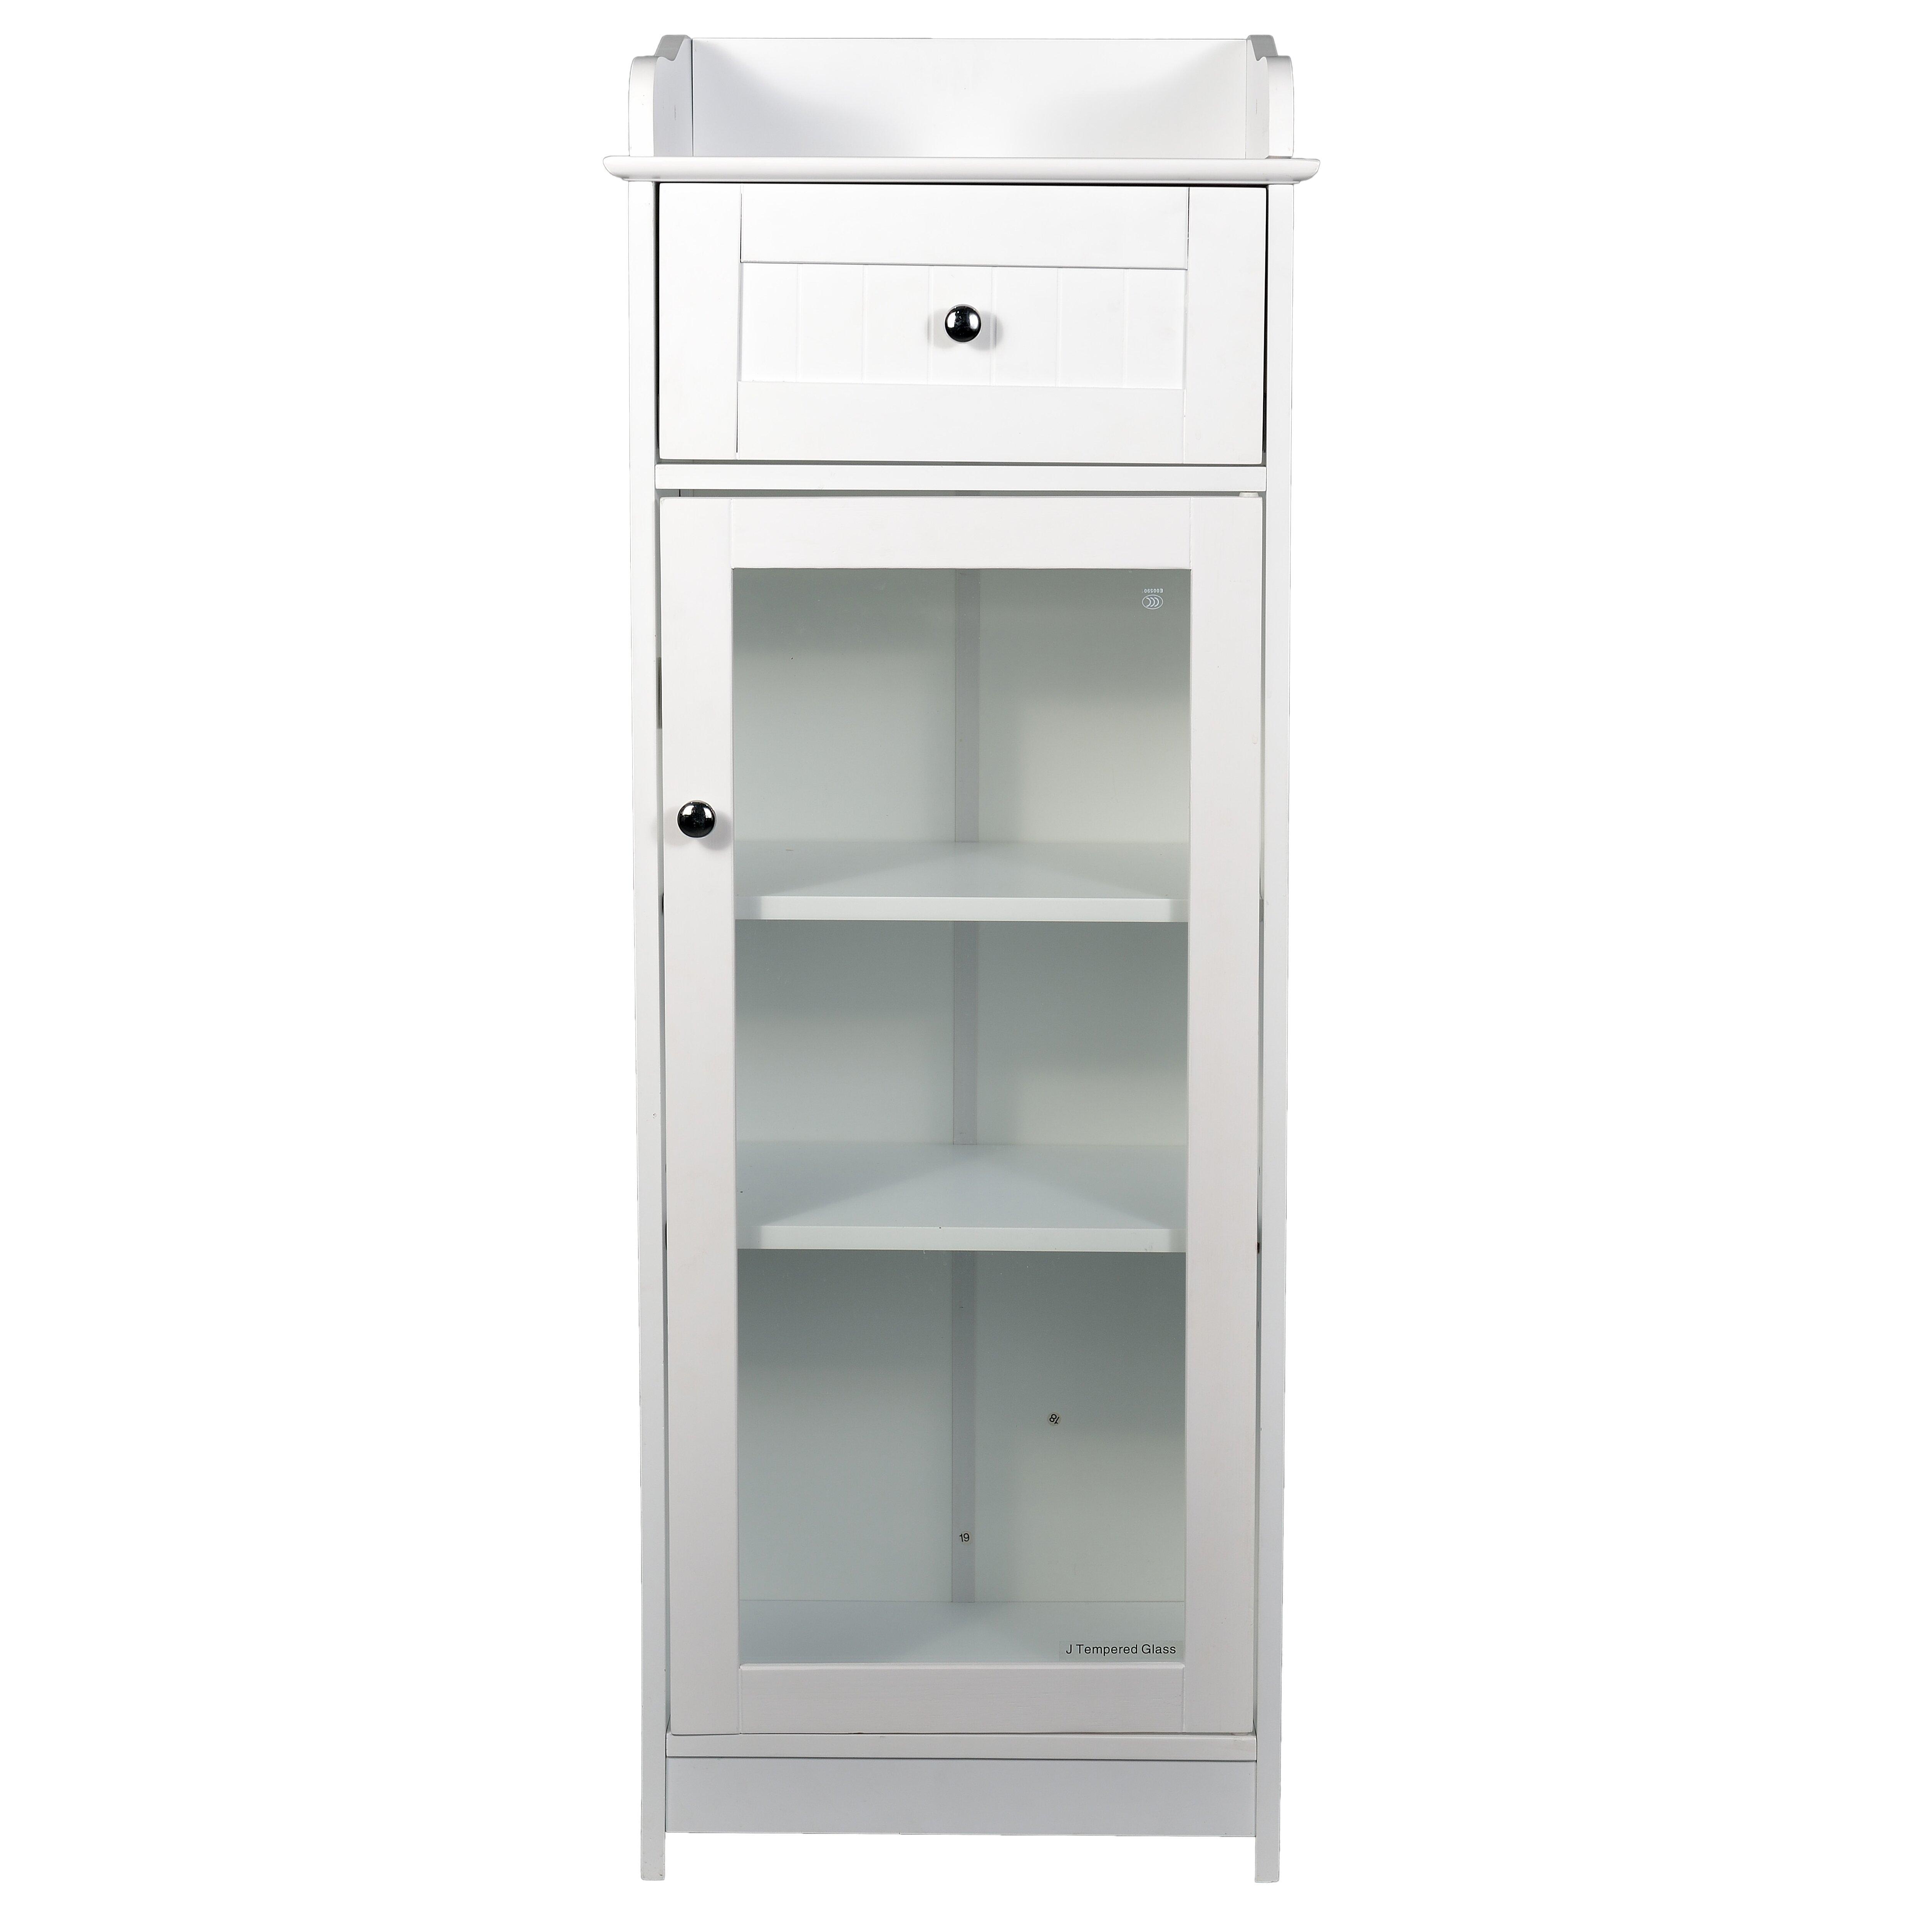 Free standing bathroom storage cabinets new york for Bathroom cabinets york